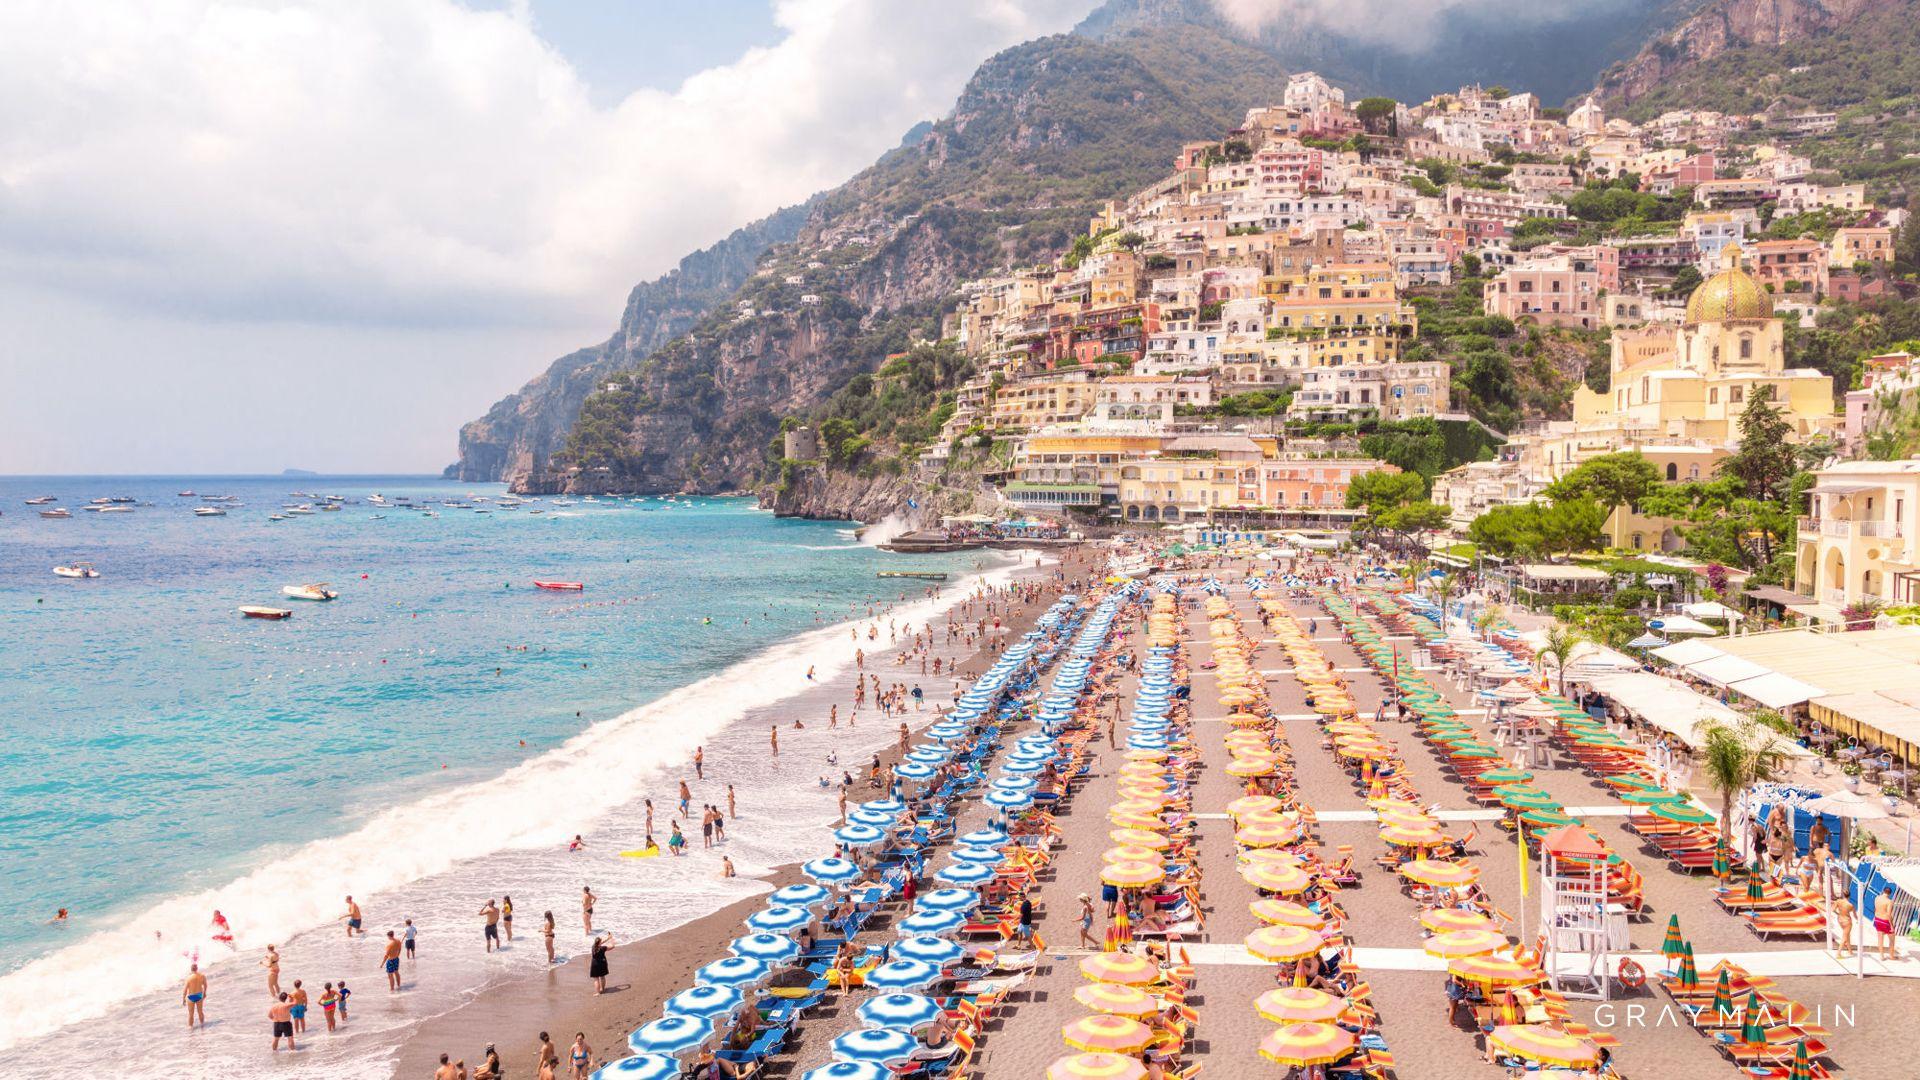 Zoom Backgrounds In 2020 Positano Beach Beach Umbrella Gray Malin